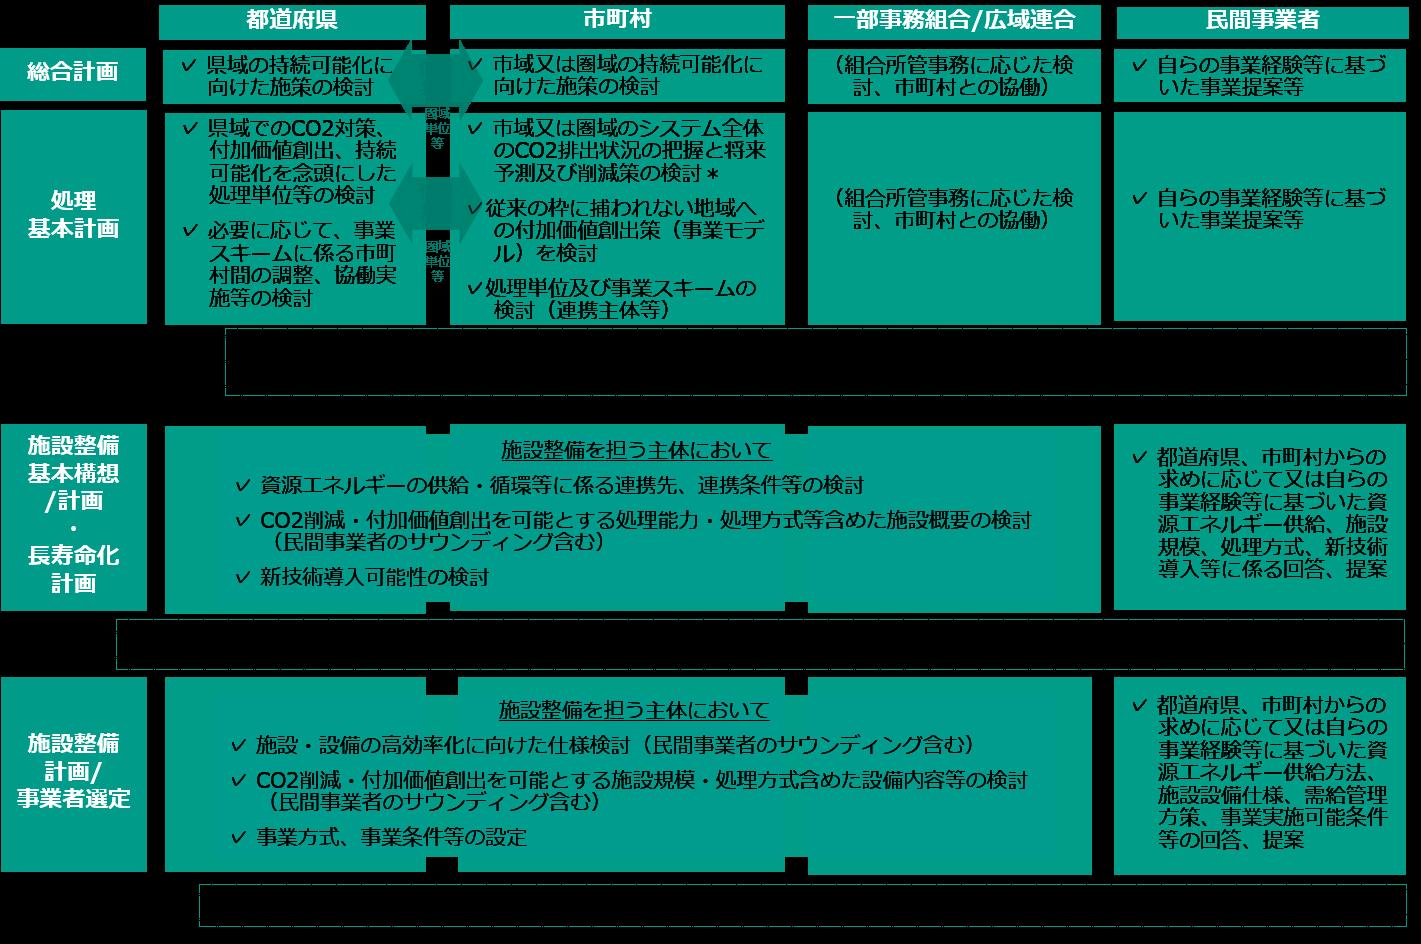 各種計画策定時の役割.png